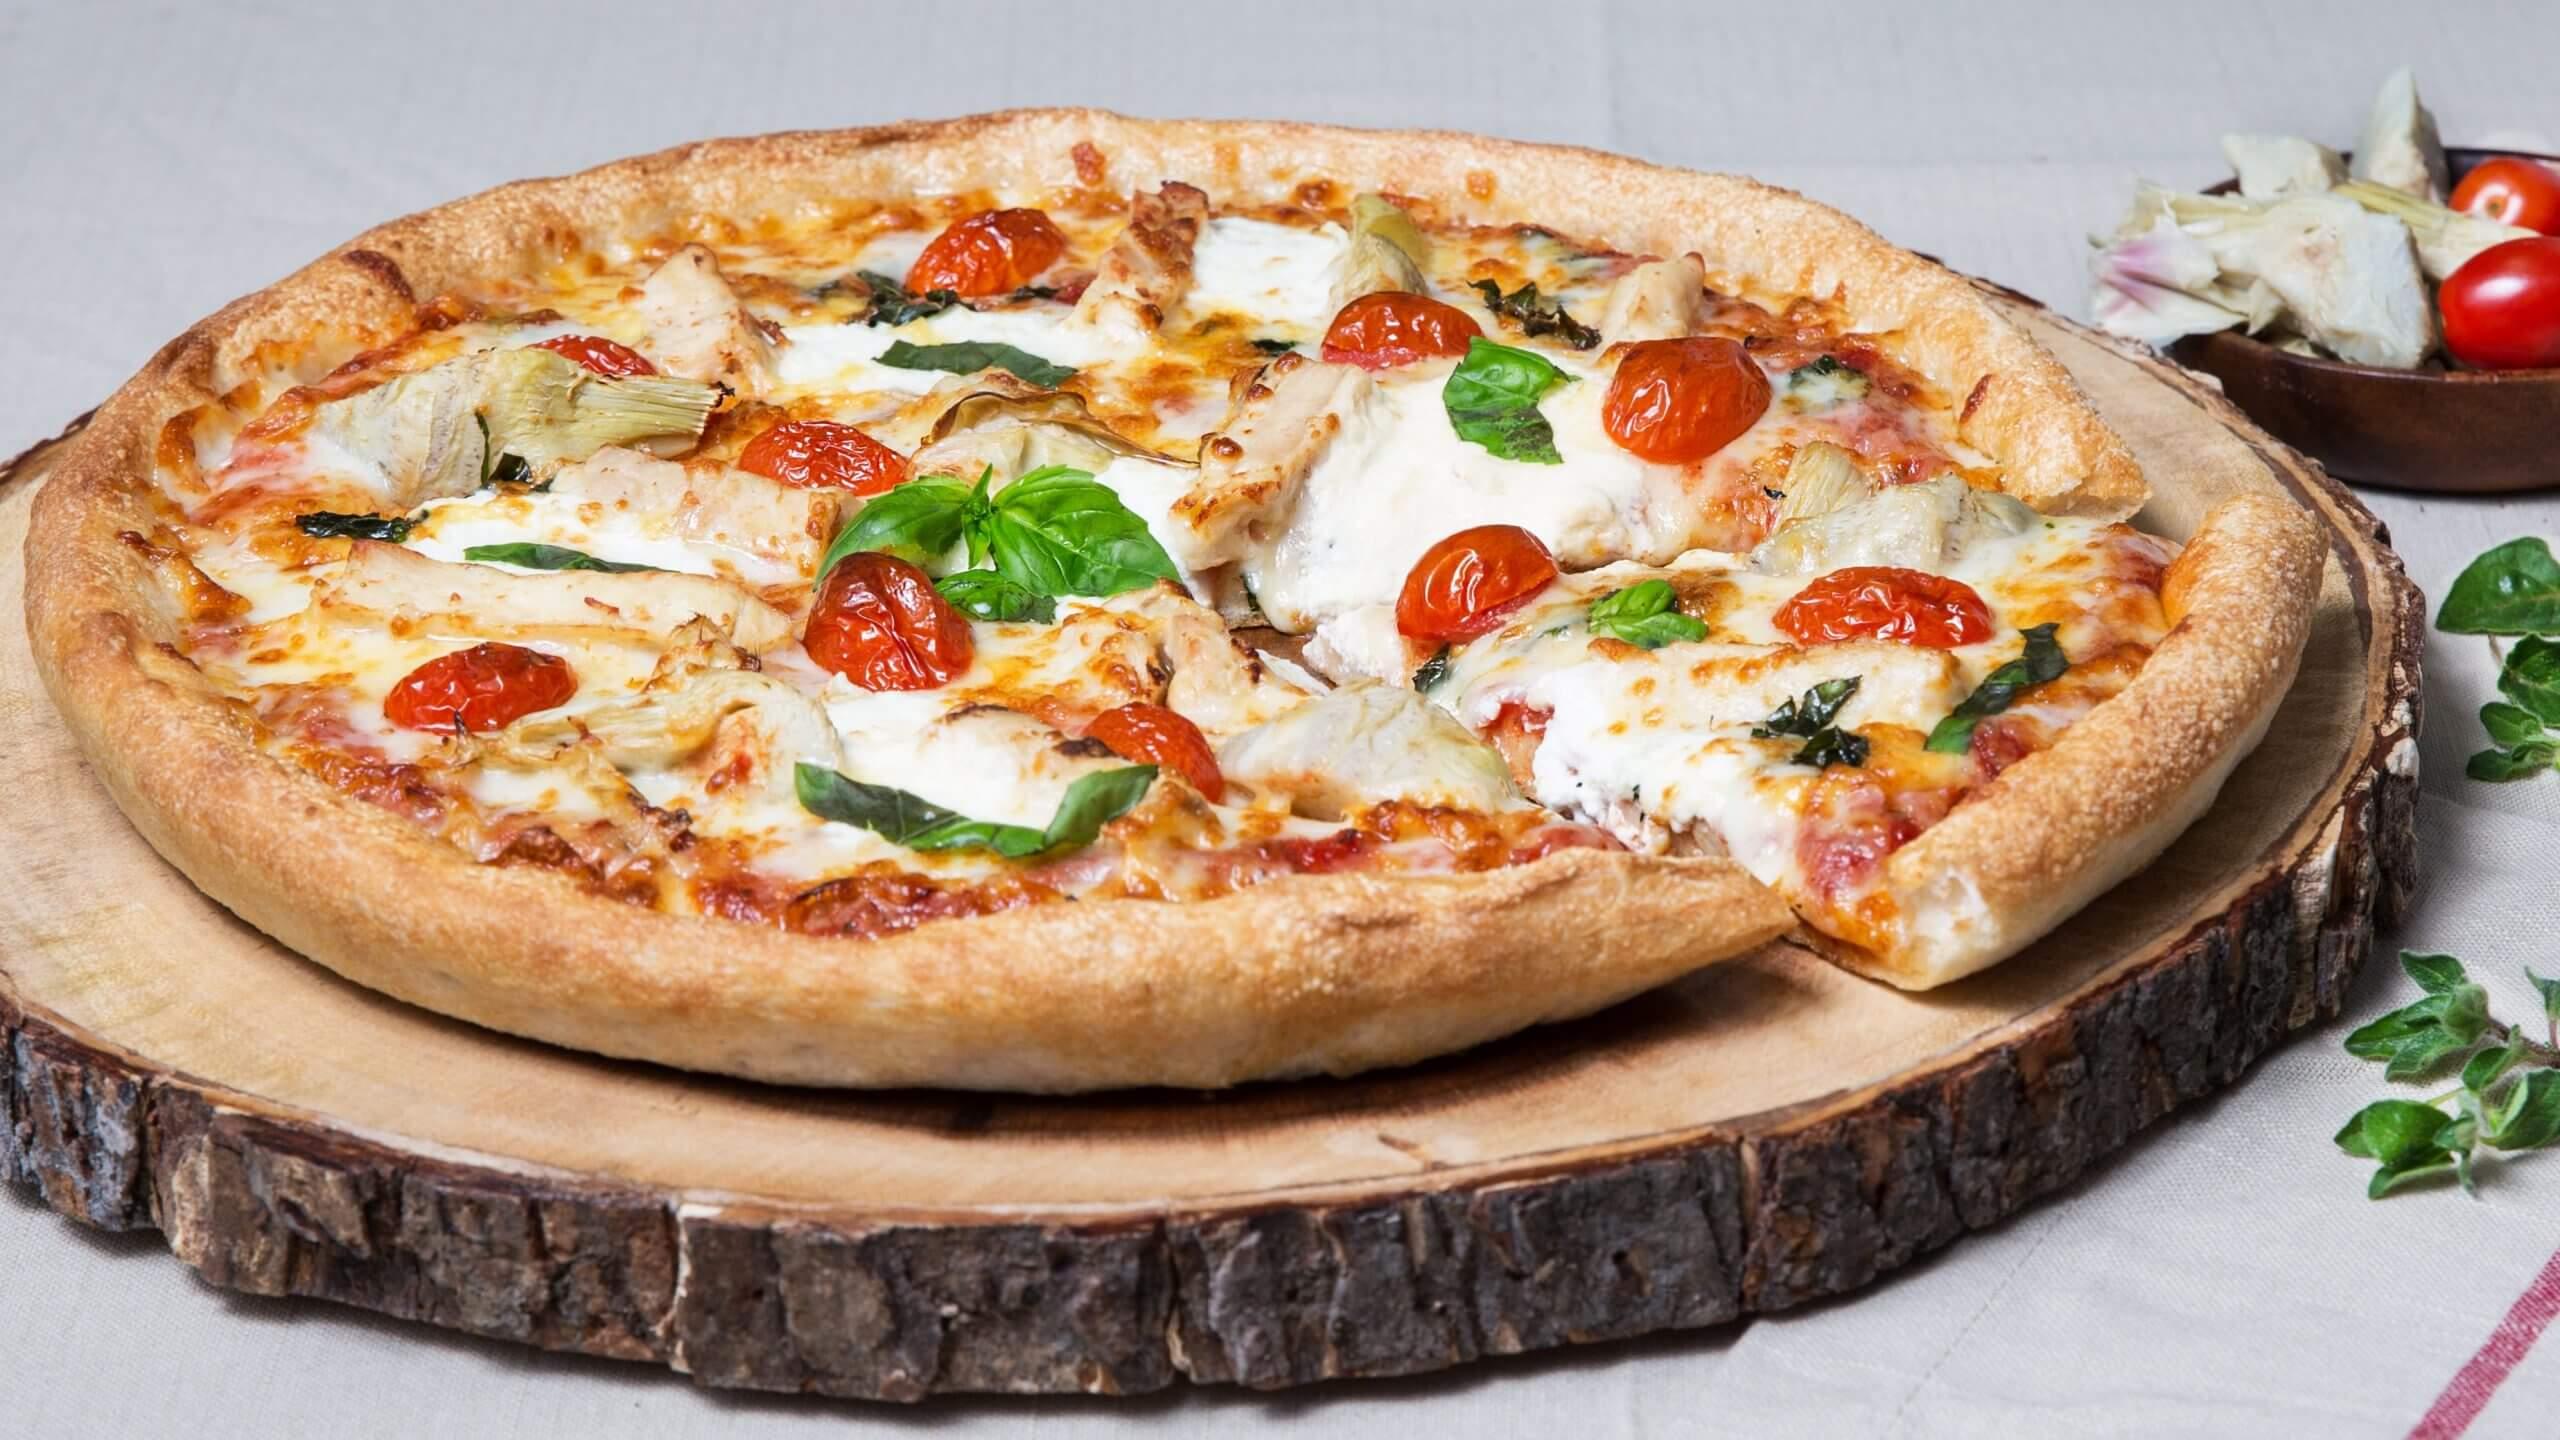 sarpino's pizza menu